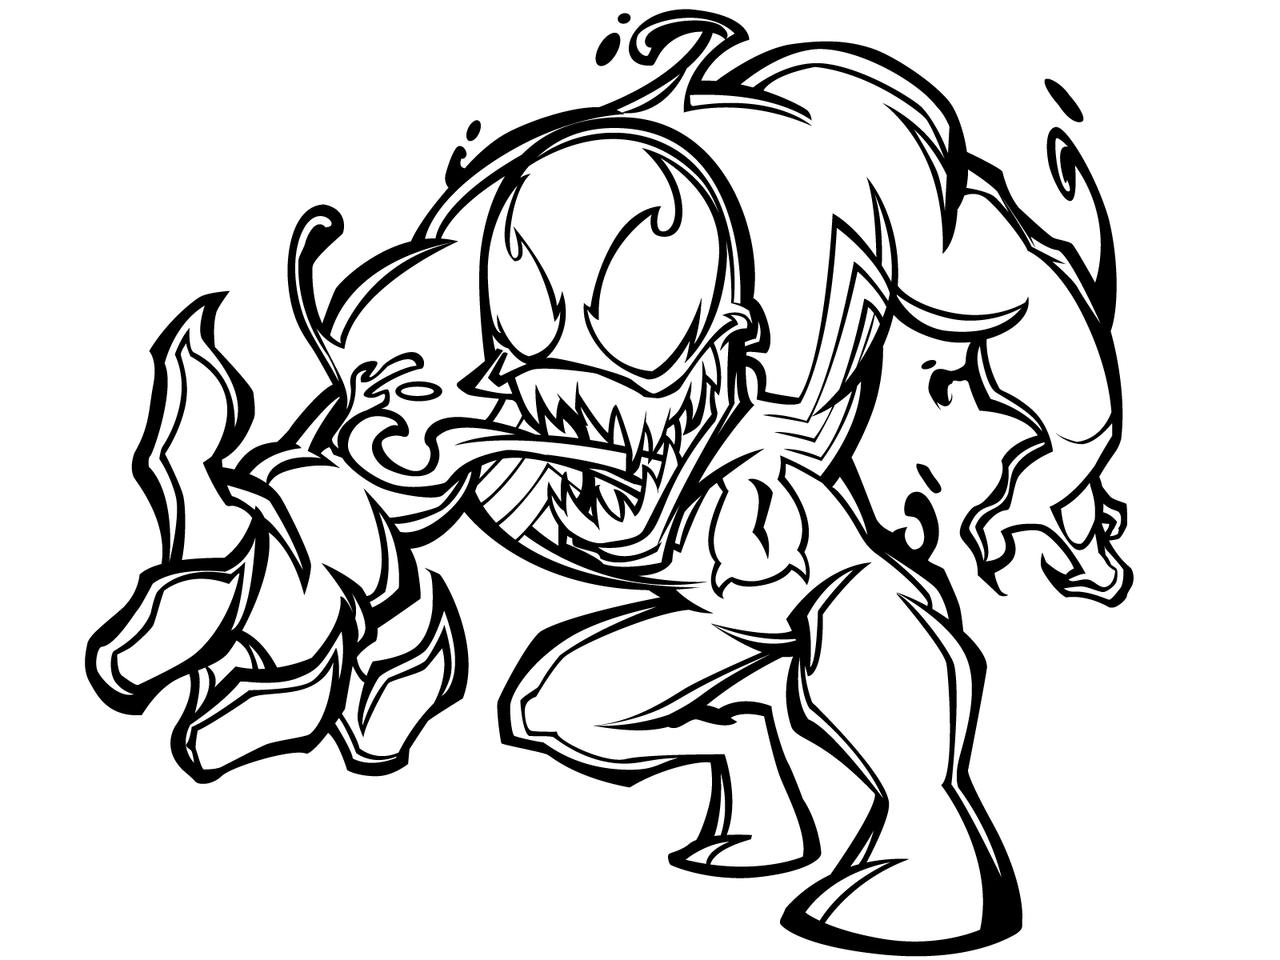 greatLP 39 s Chibi Venom Inks by sircle